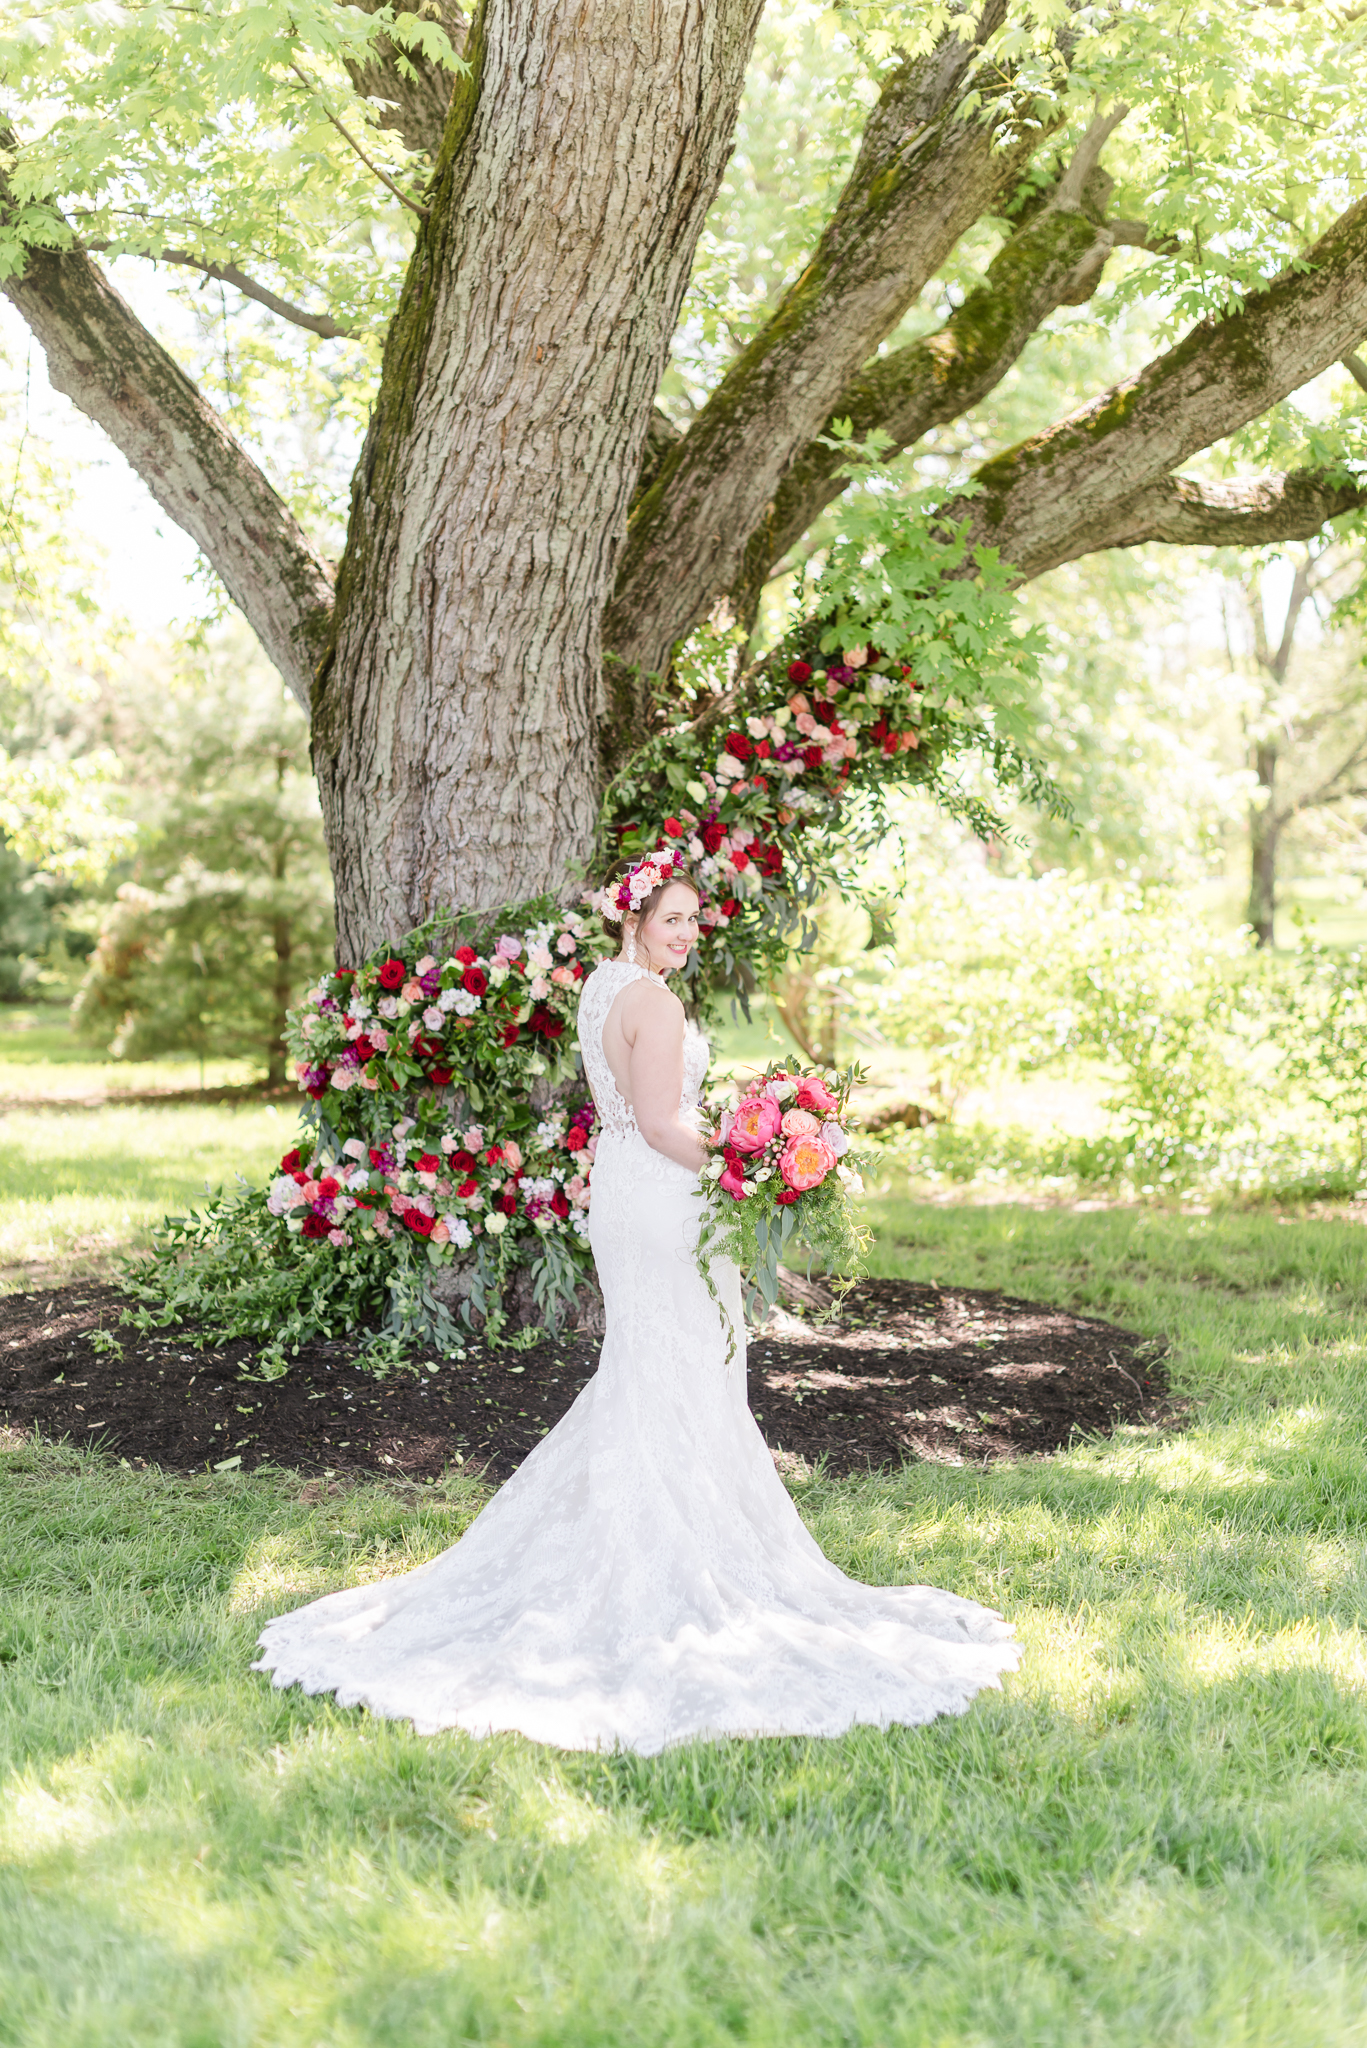 Mustard Seed Gardens Wedding Indianapolis Noblesvile Fishers Wedding Photographer-55.jpg